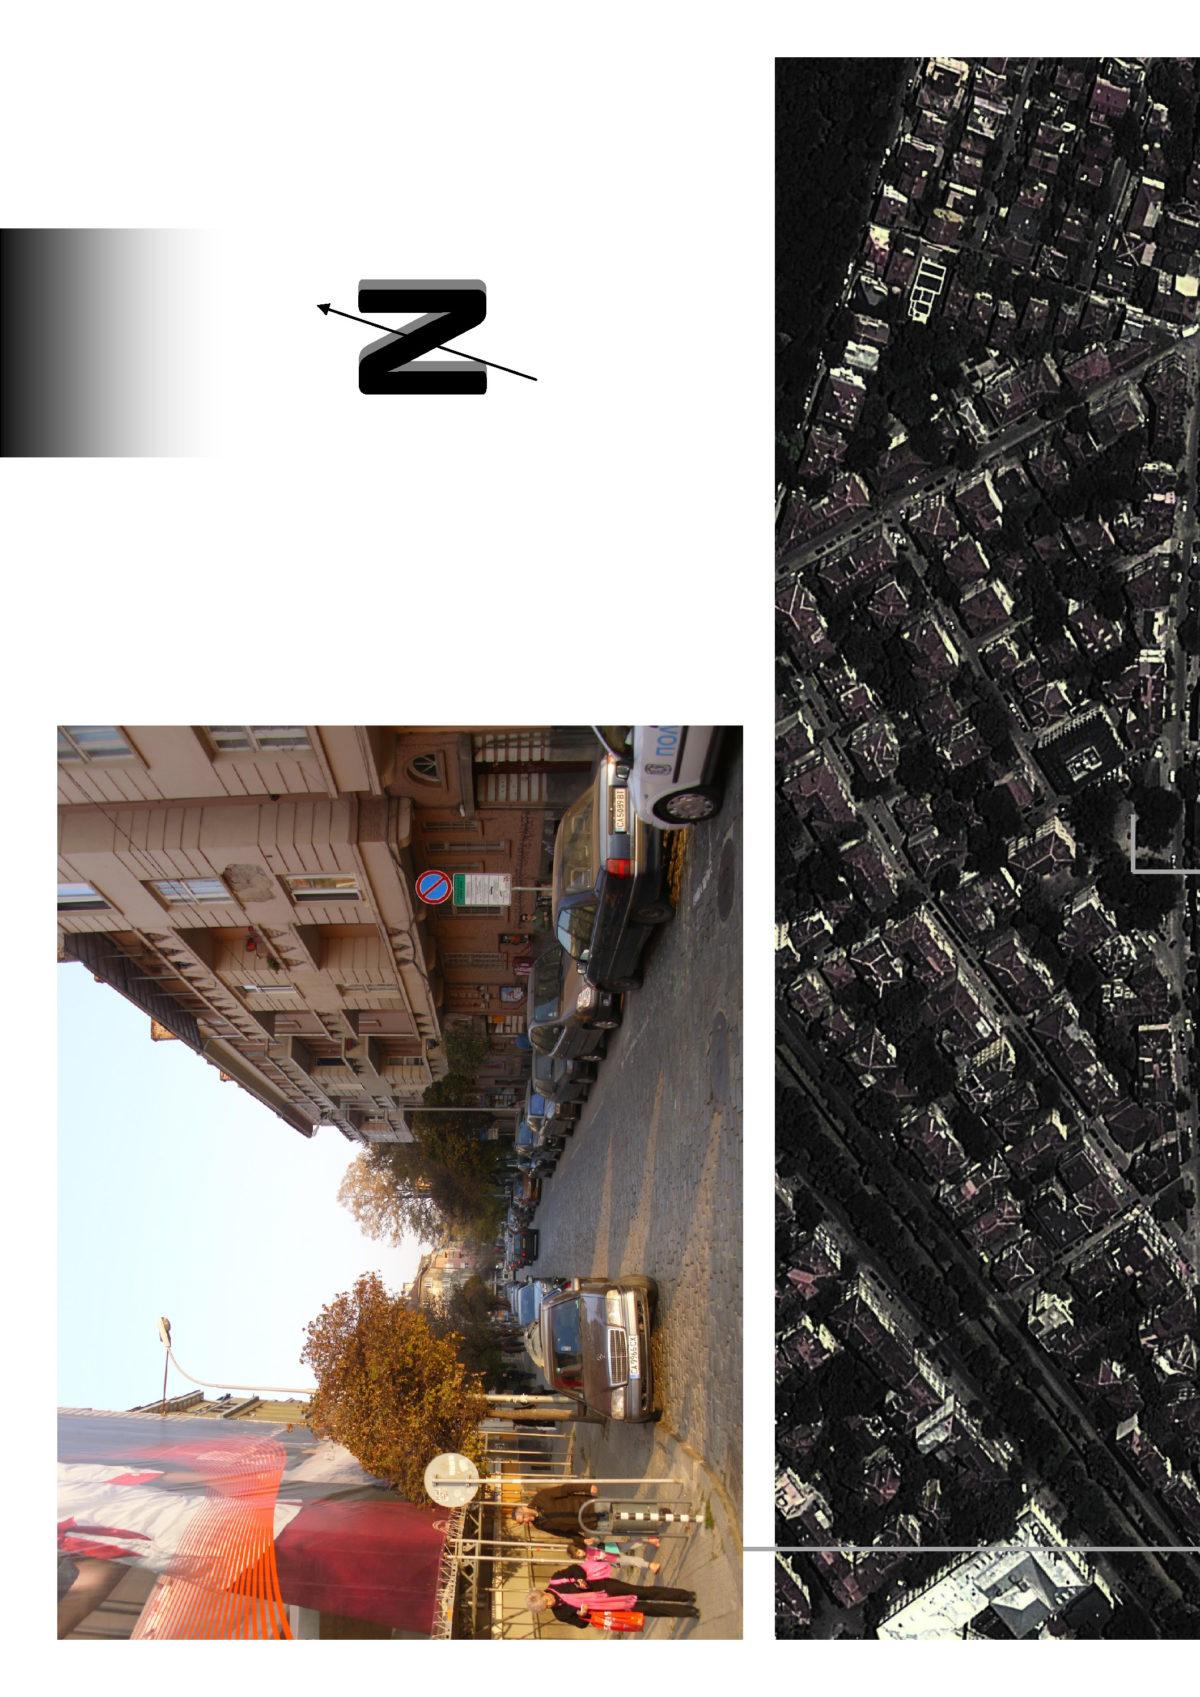 http://www.petkovstudio.com/bg/wp-content/uploads/2011/02/ivanasen_Page_04-1200x1697.jpg